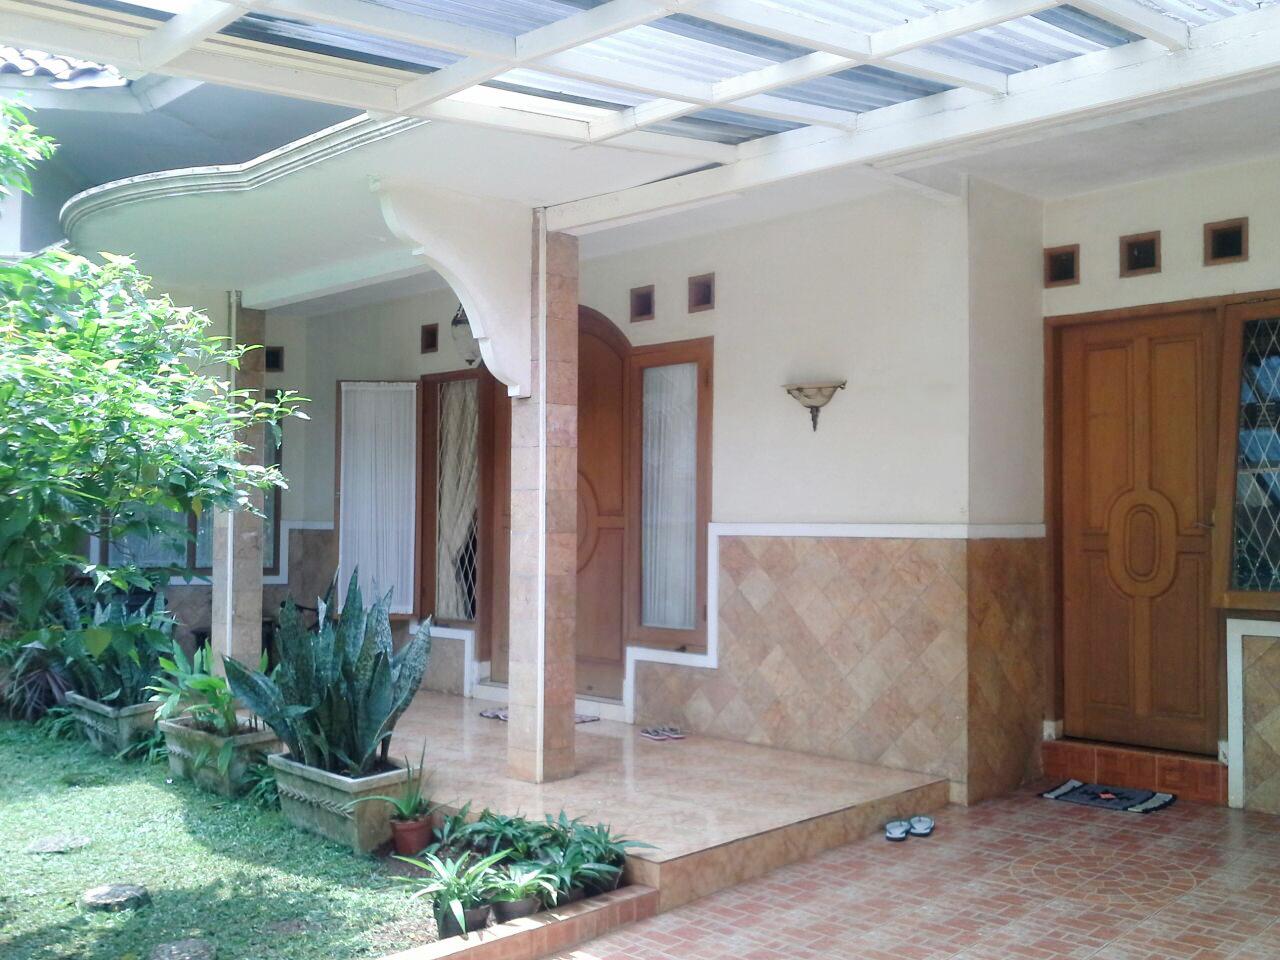 Dijual Rumah Bagus Di Villa Gunung Lestari, Jombang Tangerang